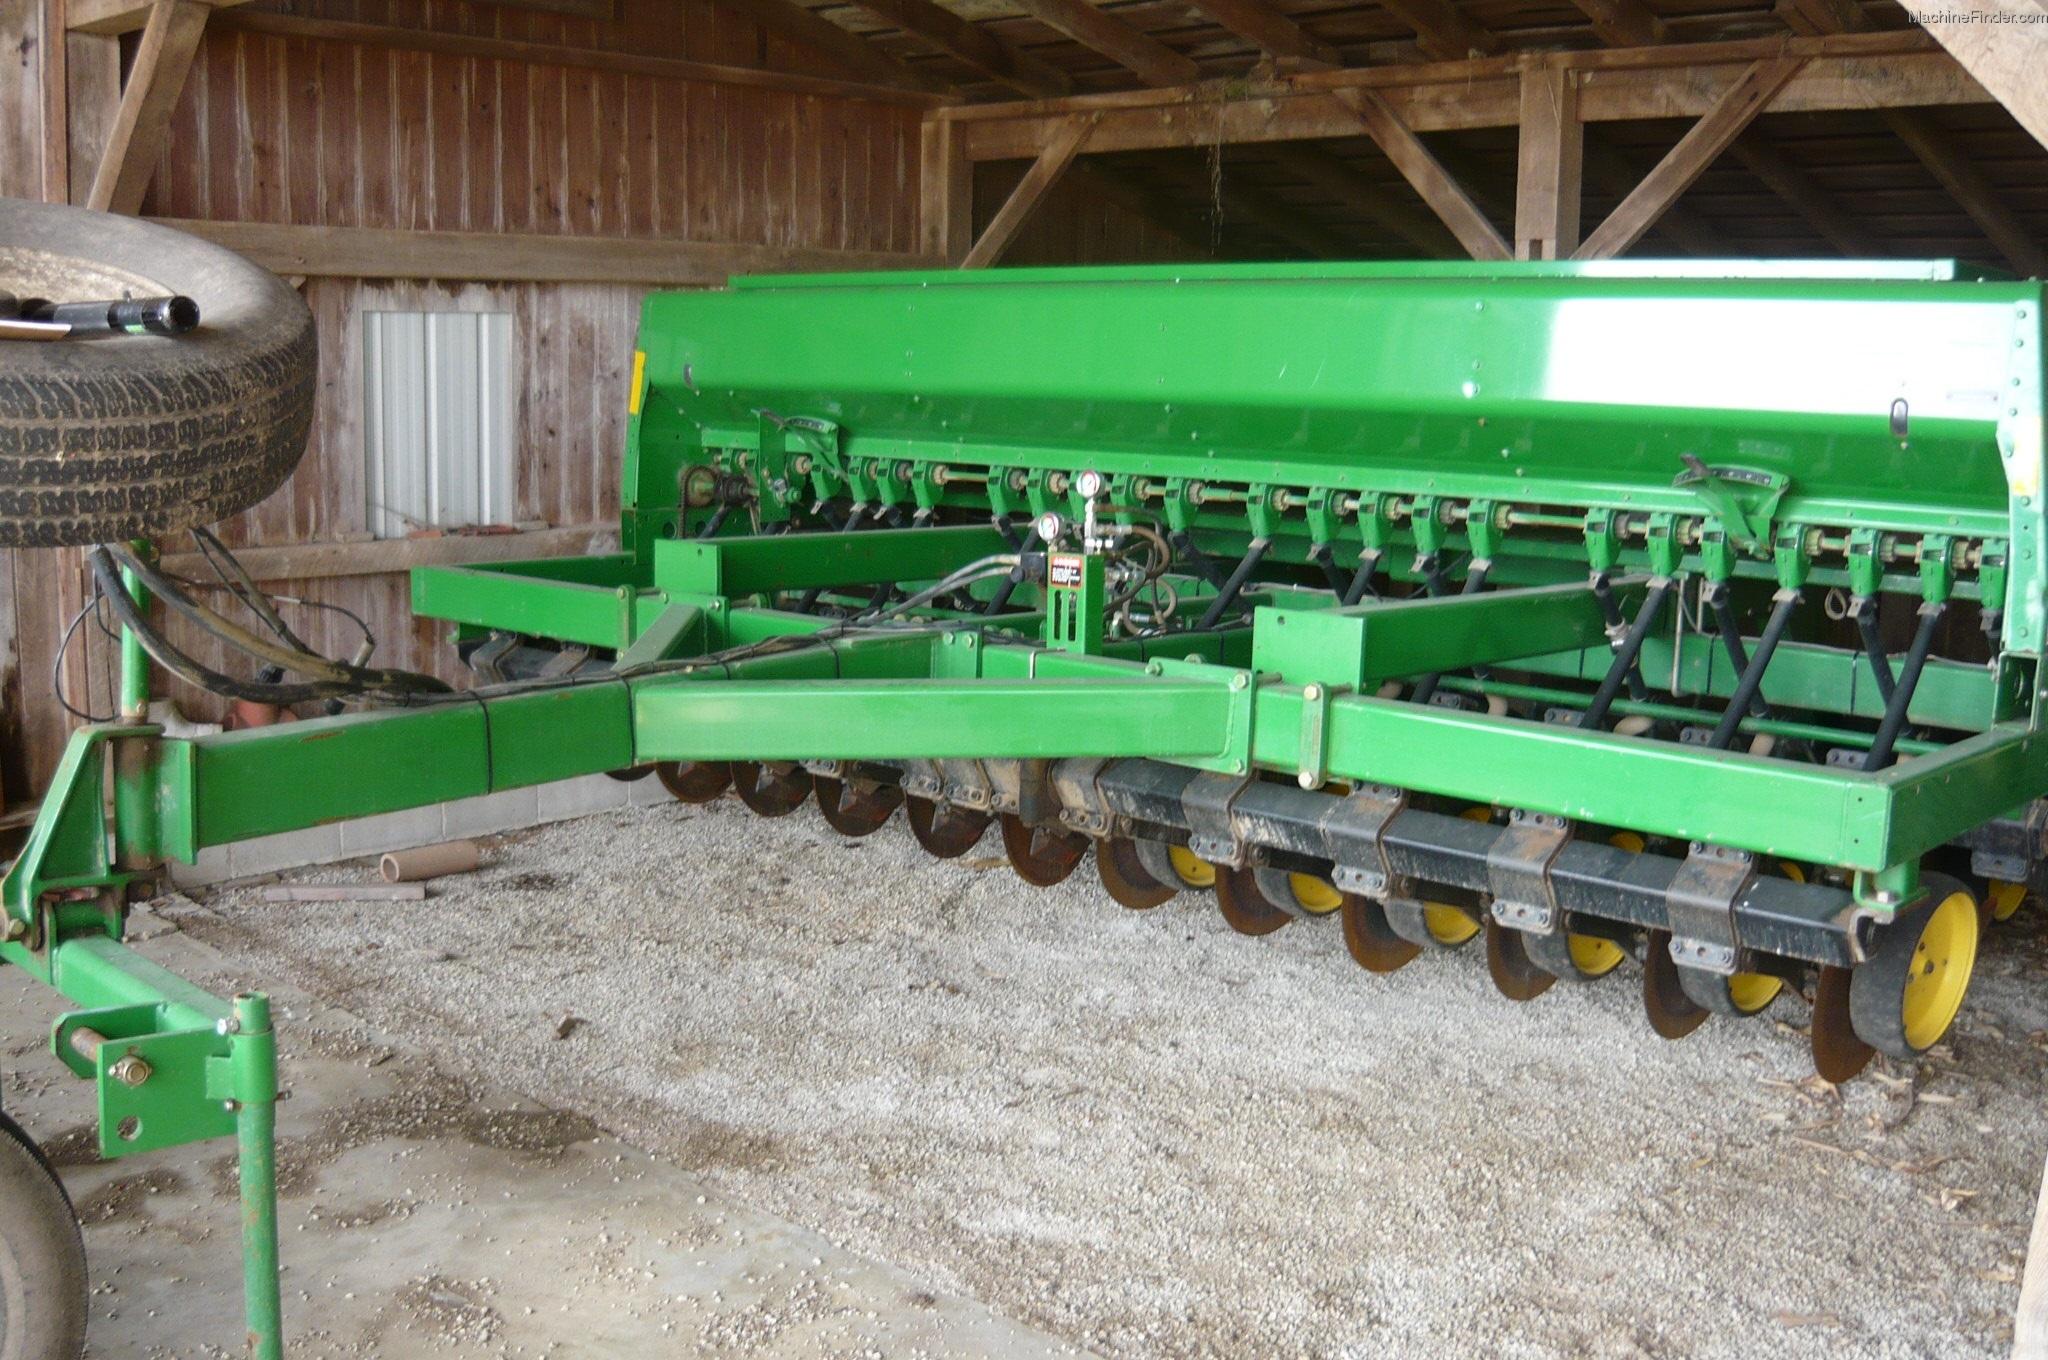 1997 John Deere 750 Planting & Seeding - Box Drills - John ...